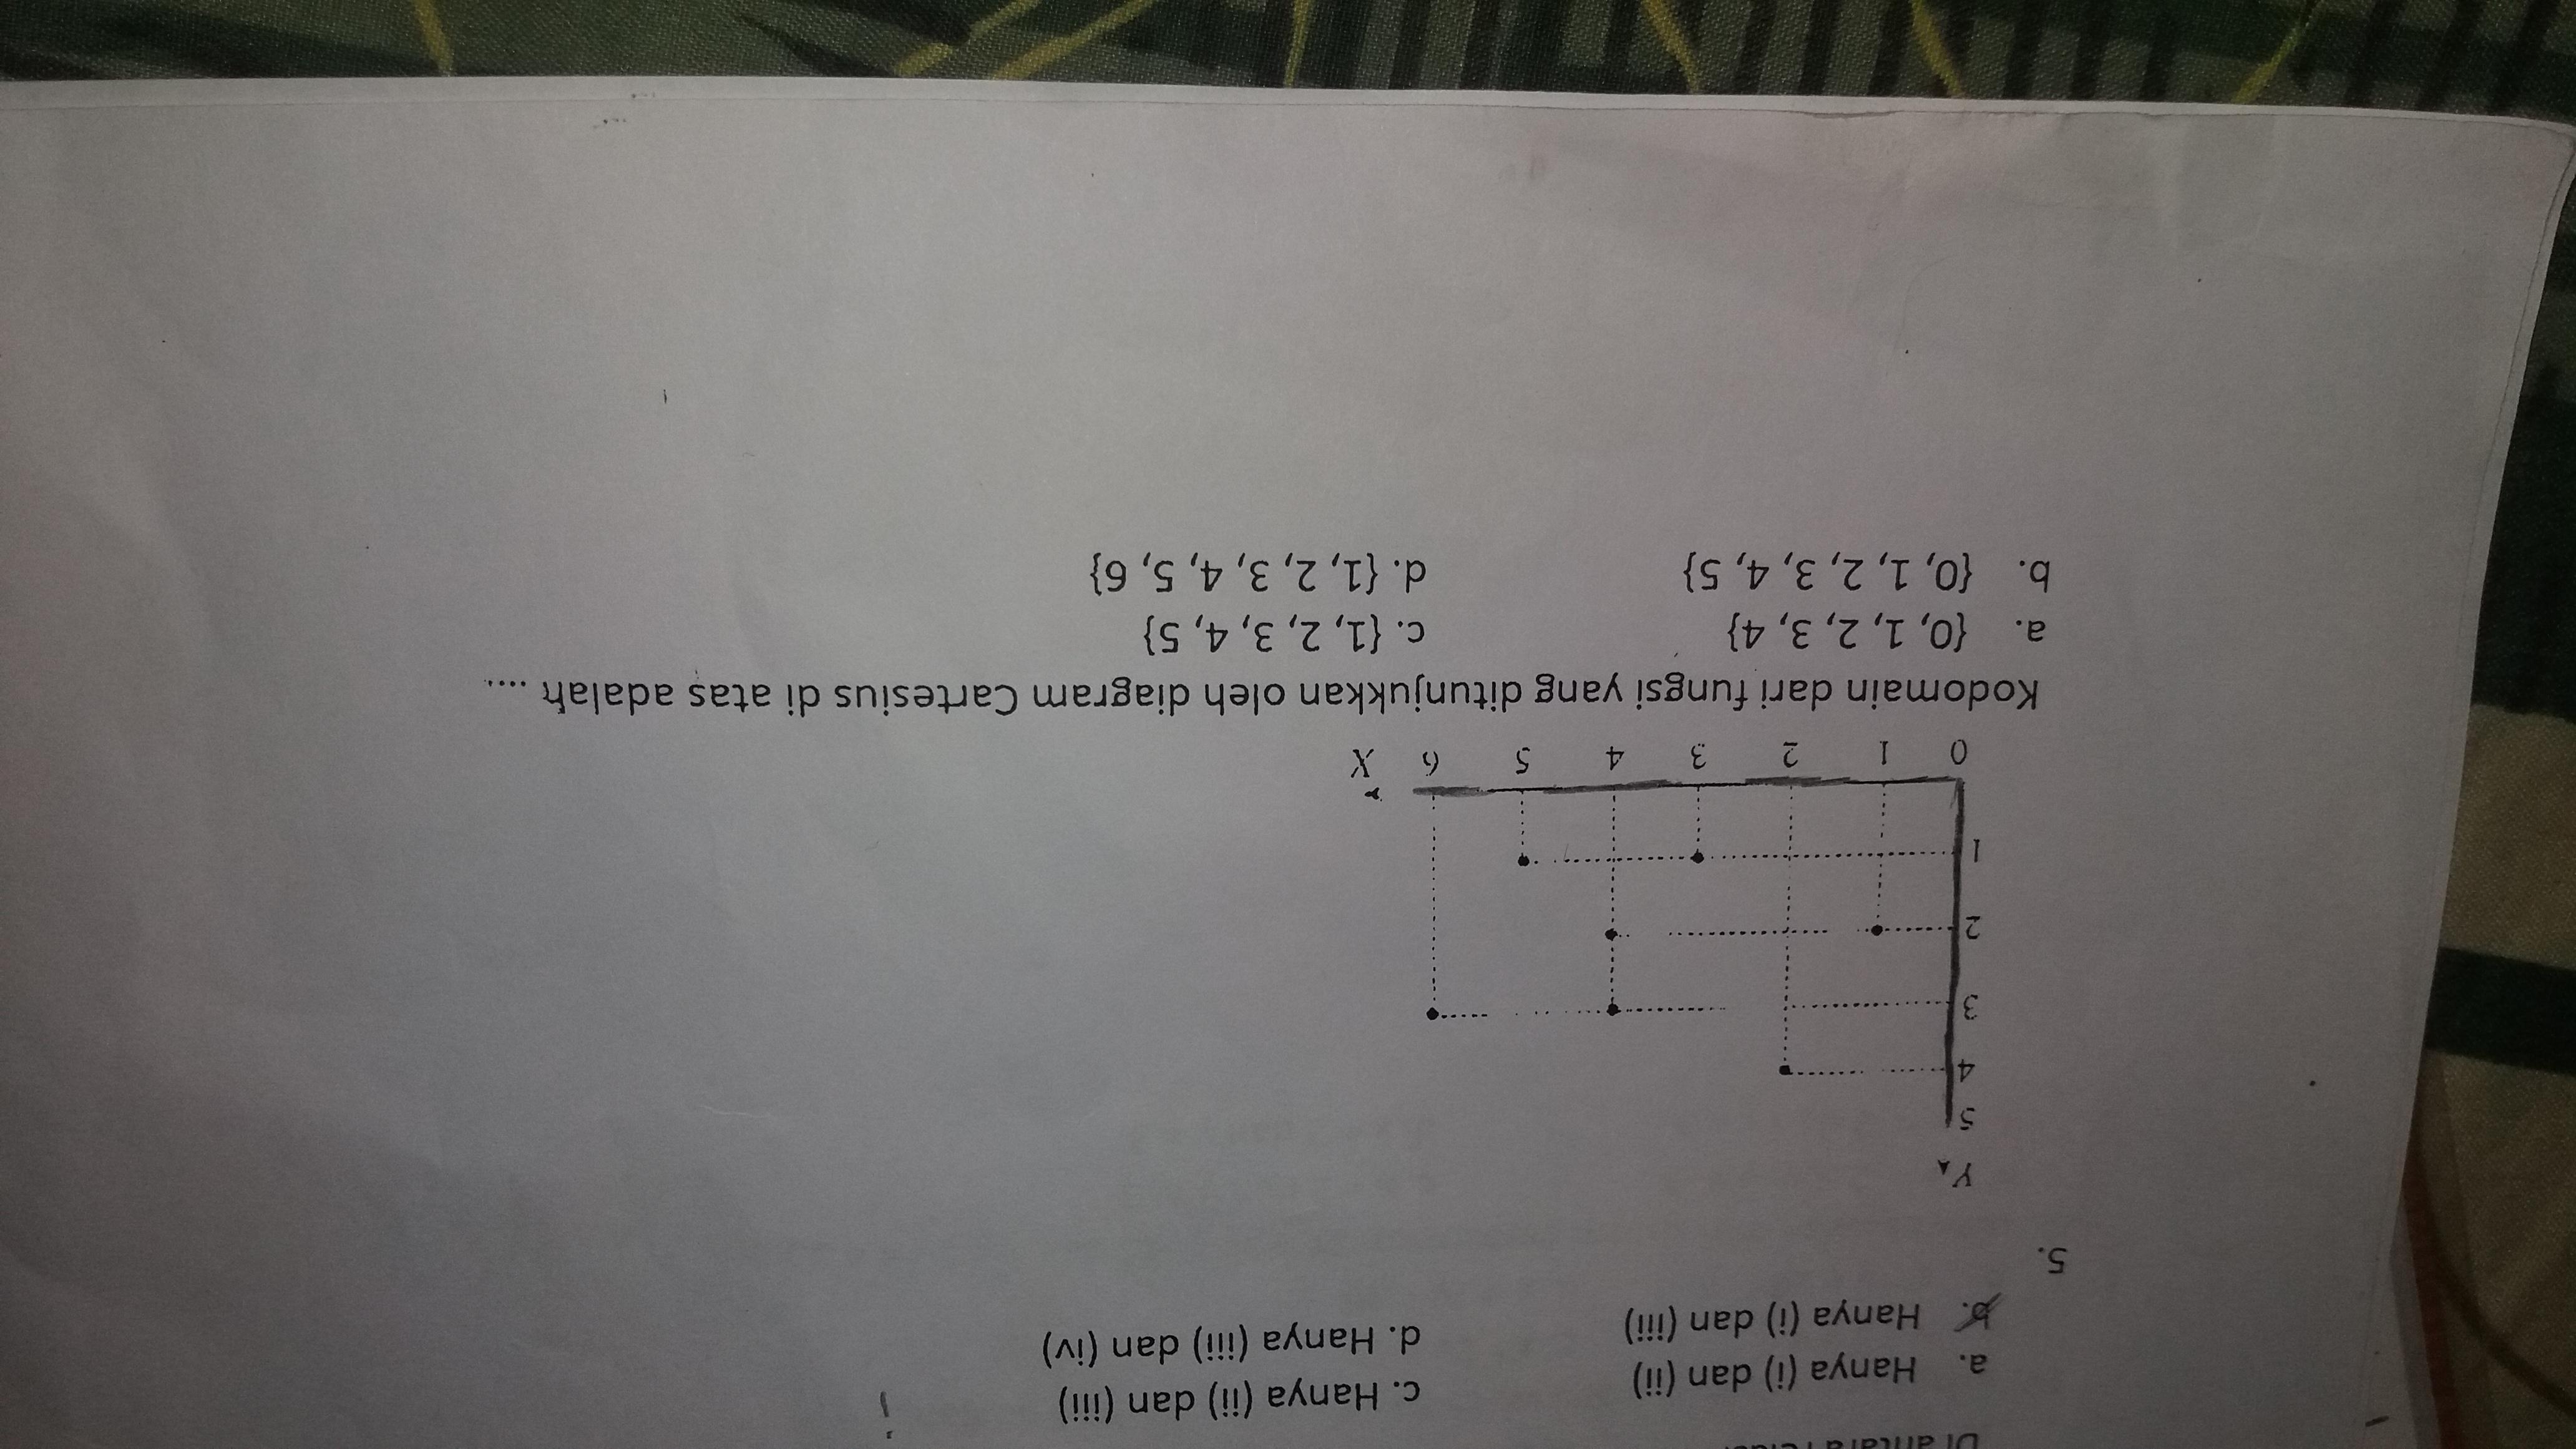 5kodomain dari fungsi yang ditunjukan diagram cartesius diatas 5kodomain dari fungsi yang ditunjukan diagram cartesius diatas adalah tolong bantuan nya kalau ada caranya pake cara ya ccuart Images